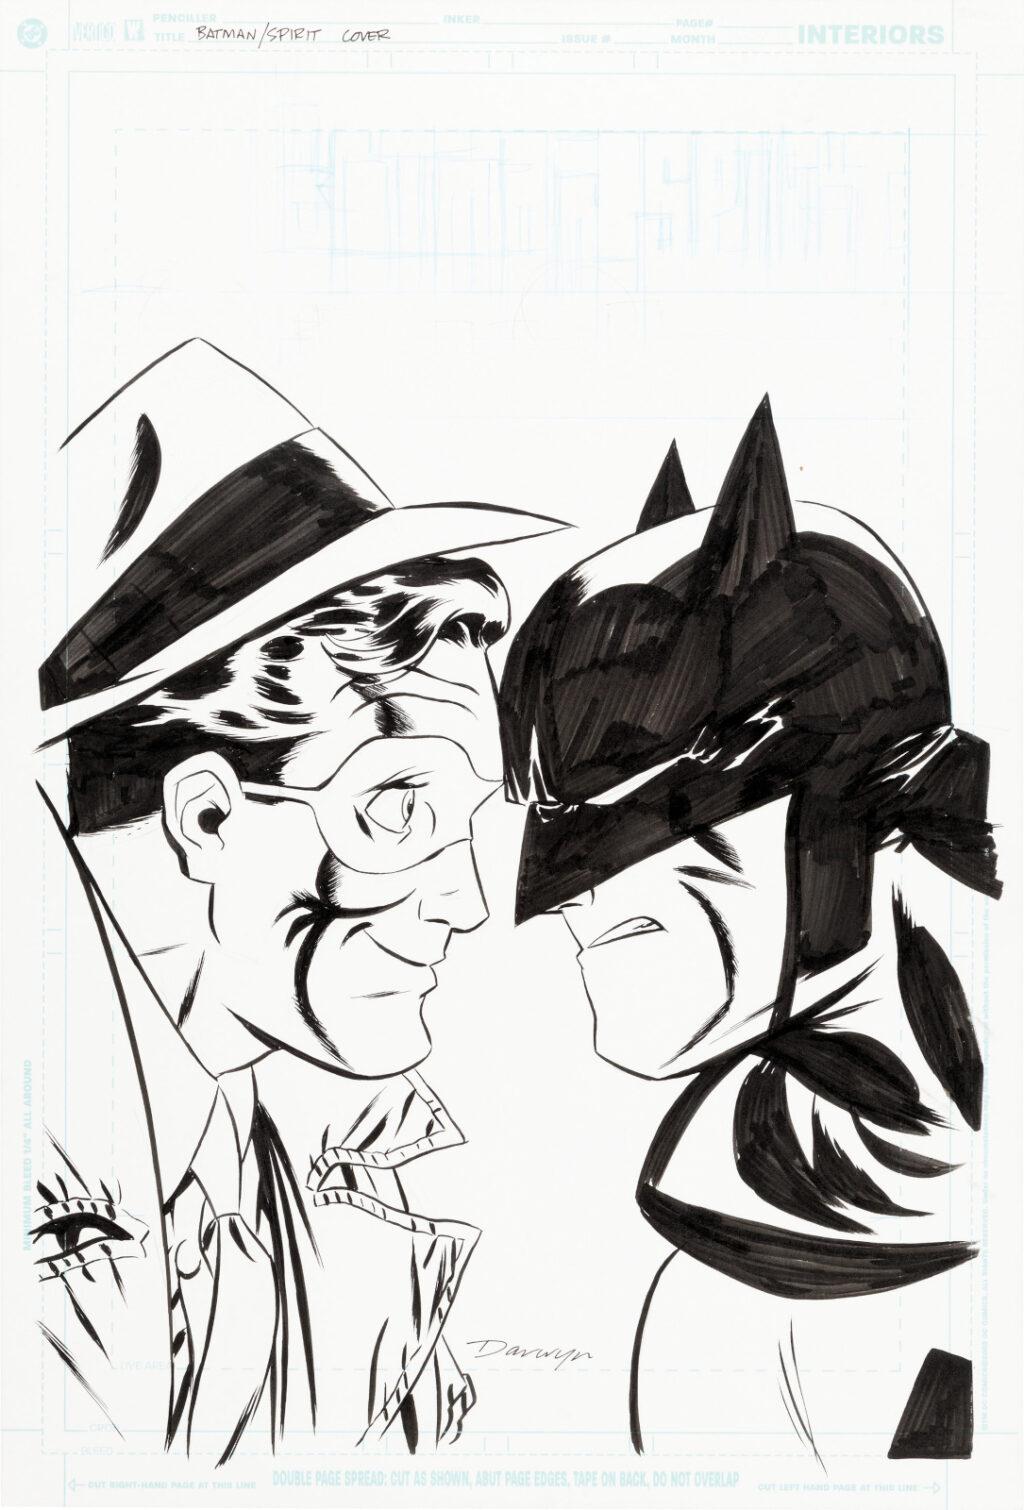 Batman The Spirit issue 1 cover by Darwyn Cooke